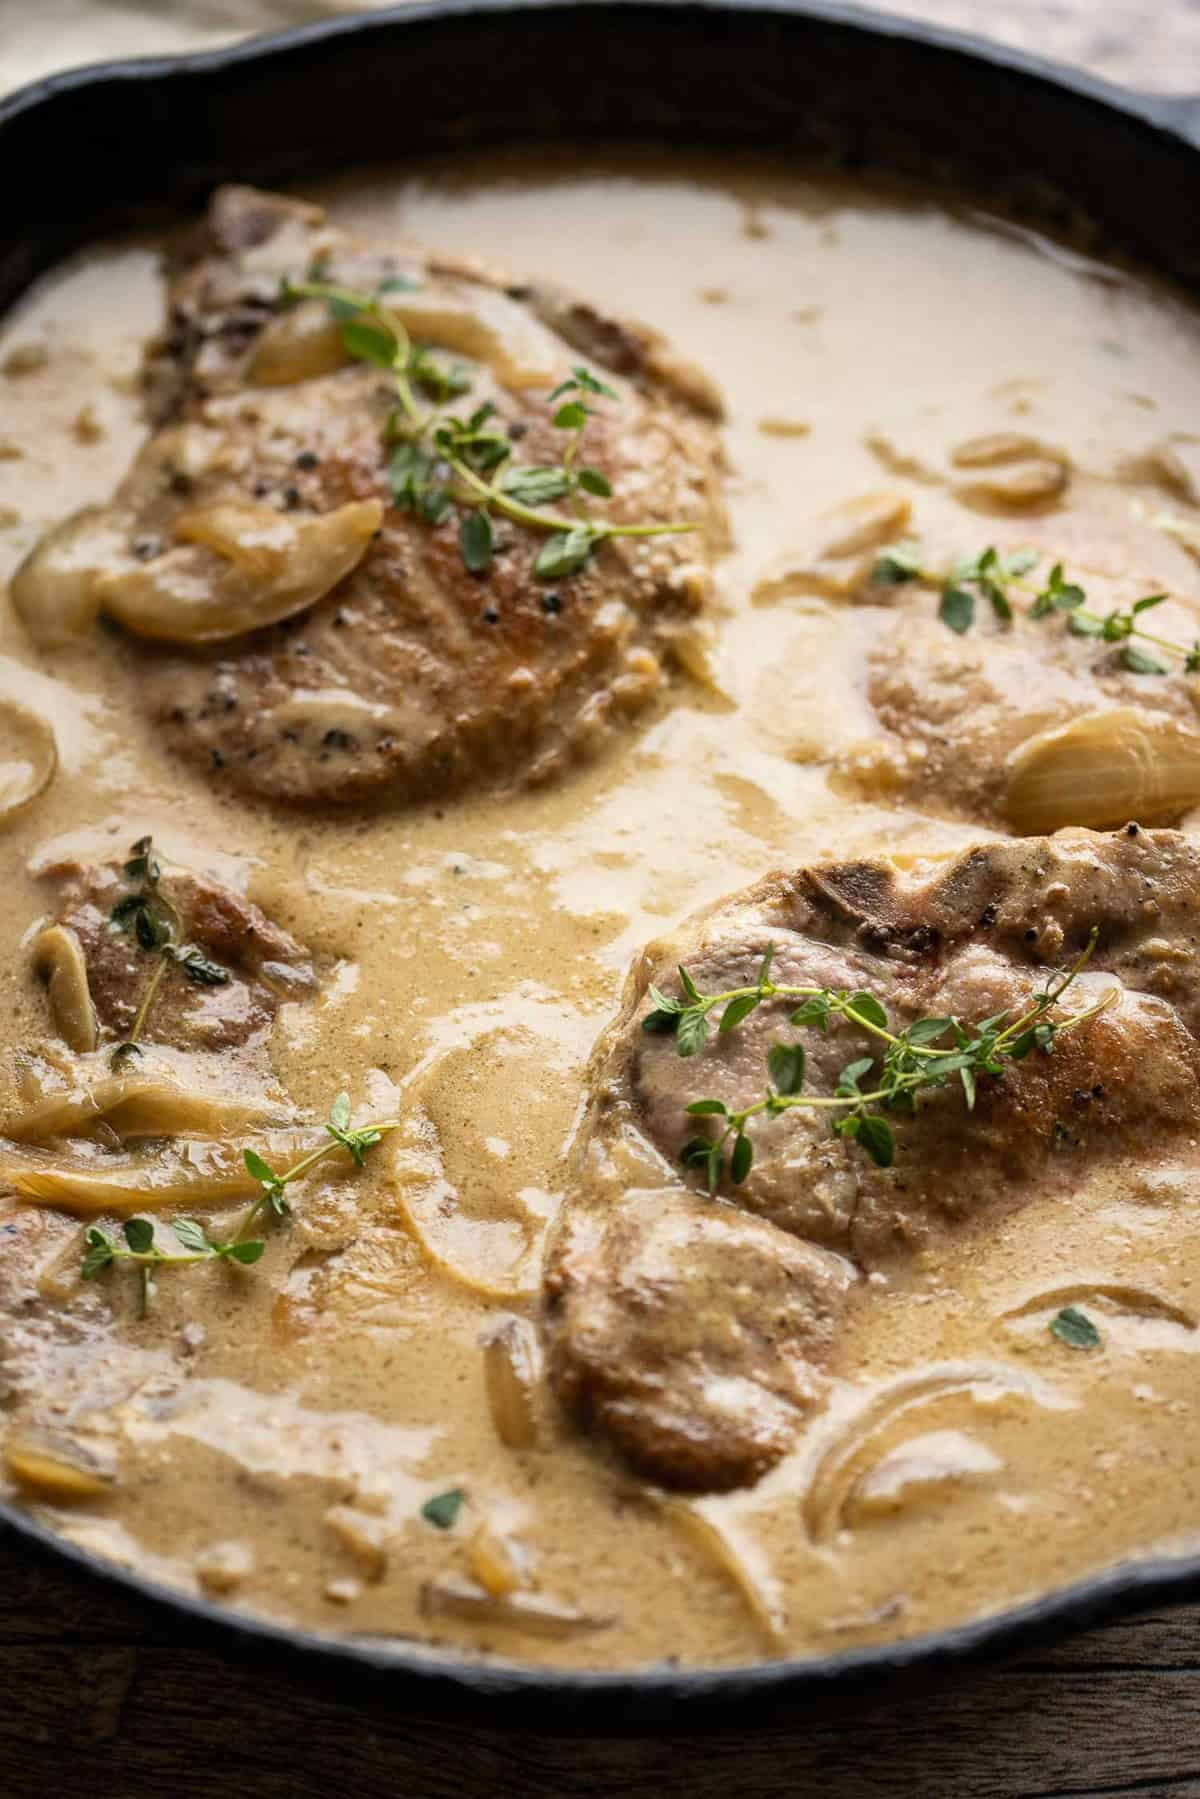 Pork chops in creamy gravy.